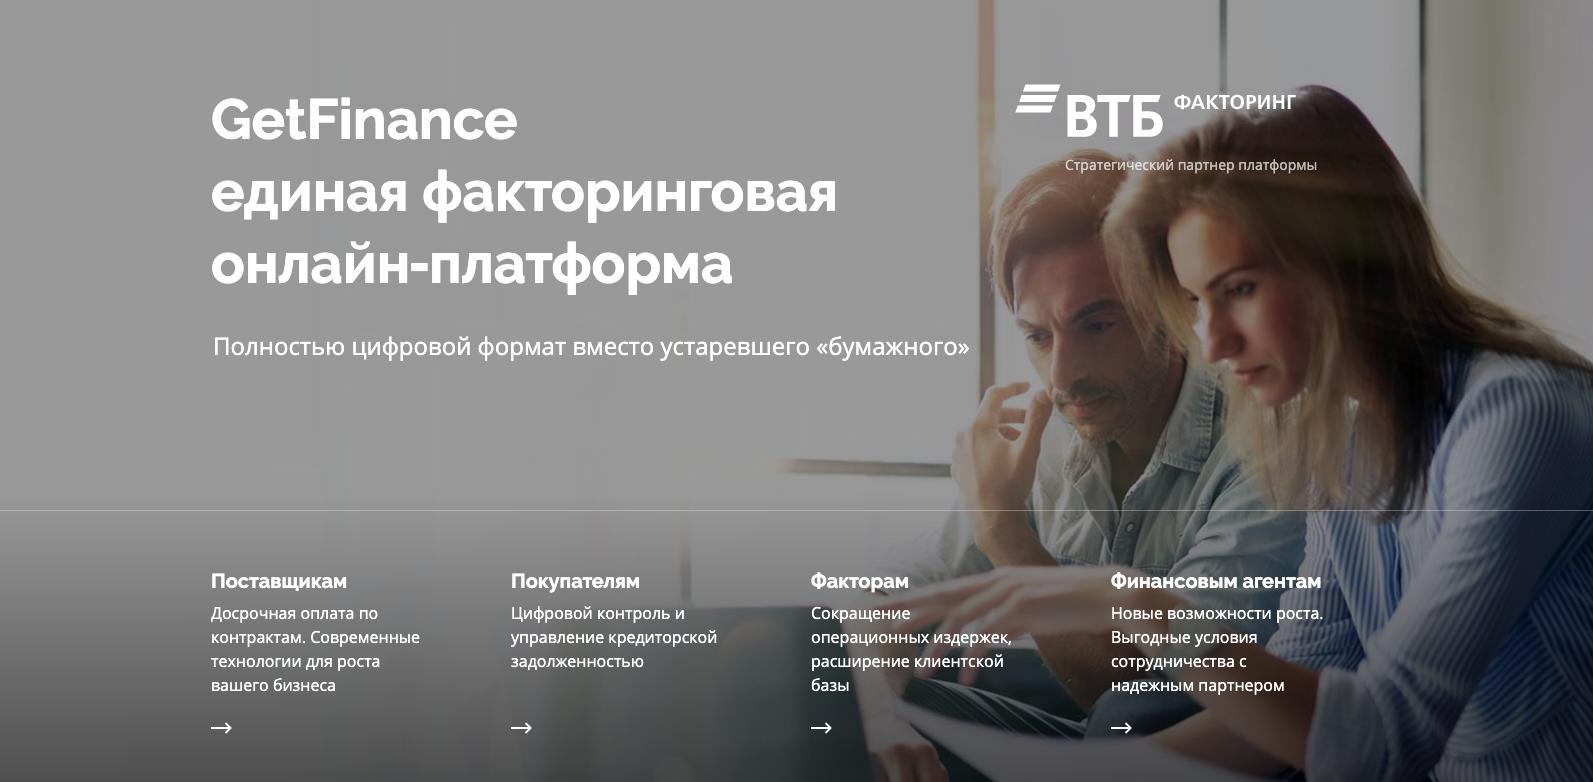 Финтех-платформа GetFinance